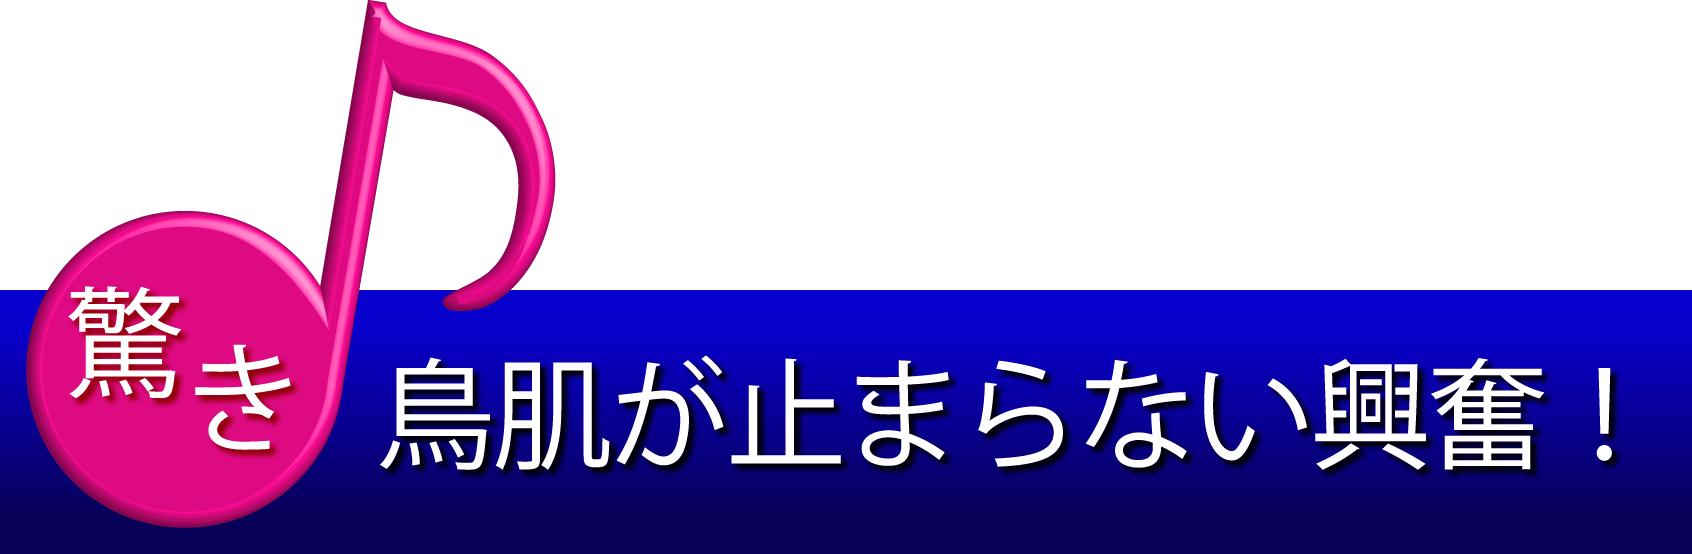 banner_HP-basic01_02_odoroki@2x